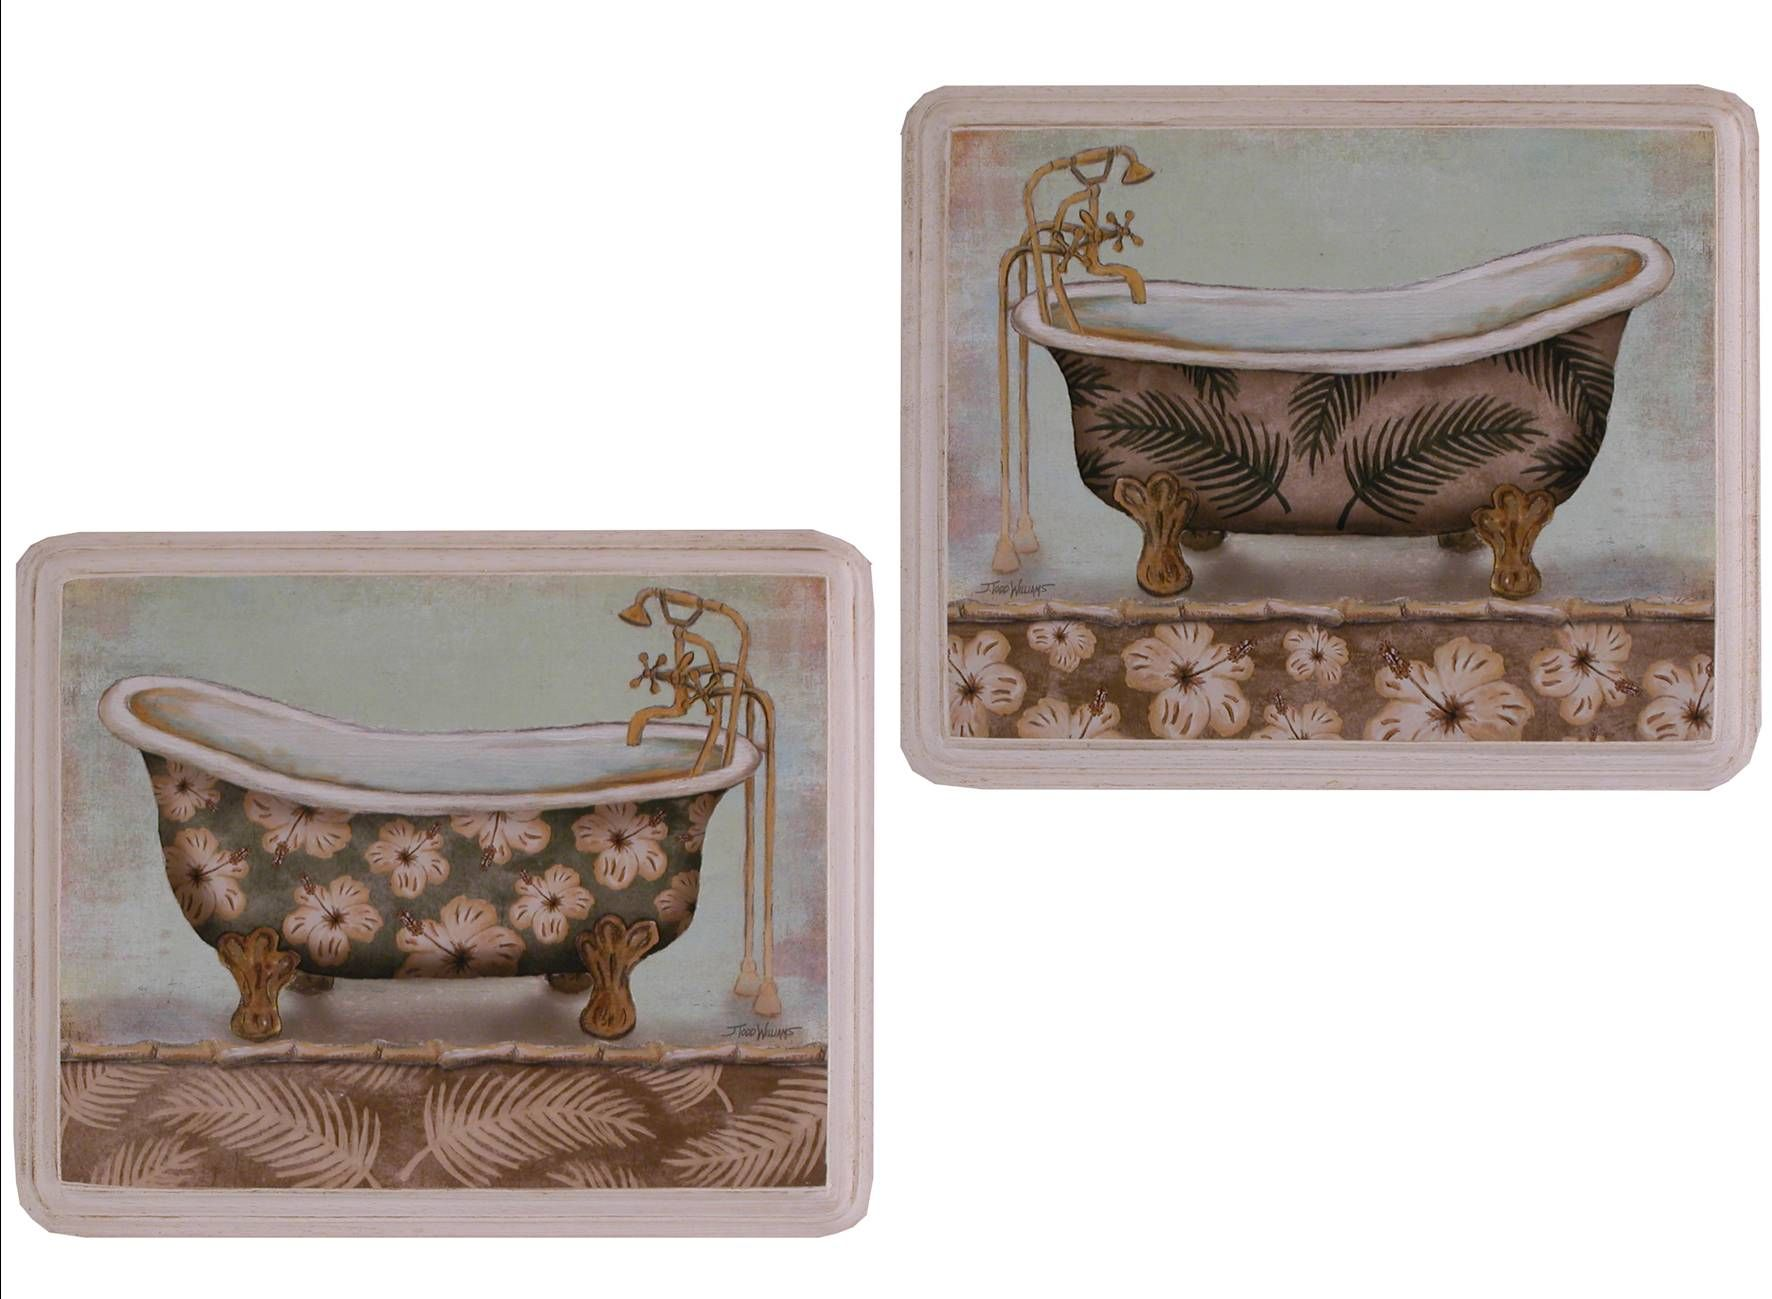 Quadri Classici Per Arredamento i quadri in legno raffiguranti vasche da bagno stravaganti